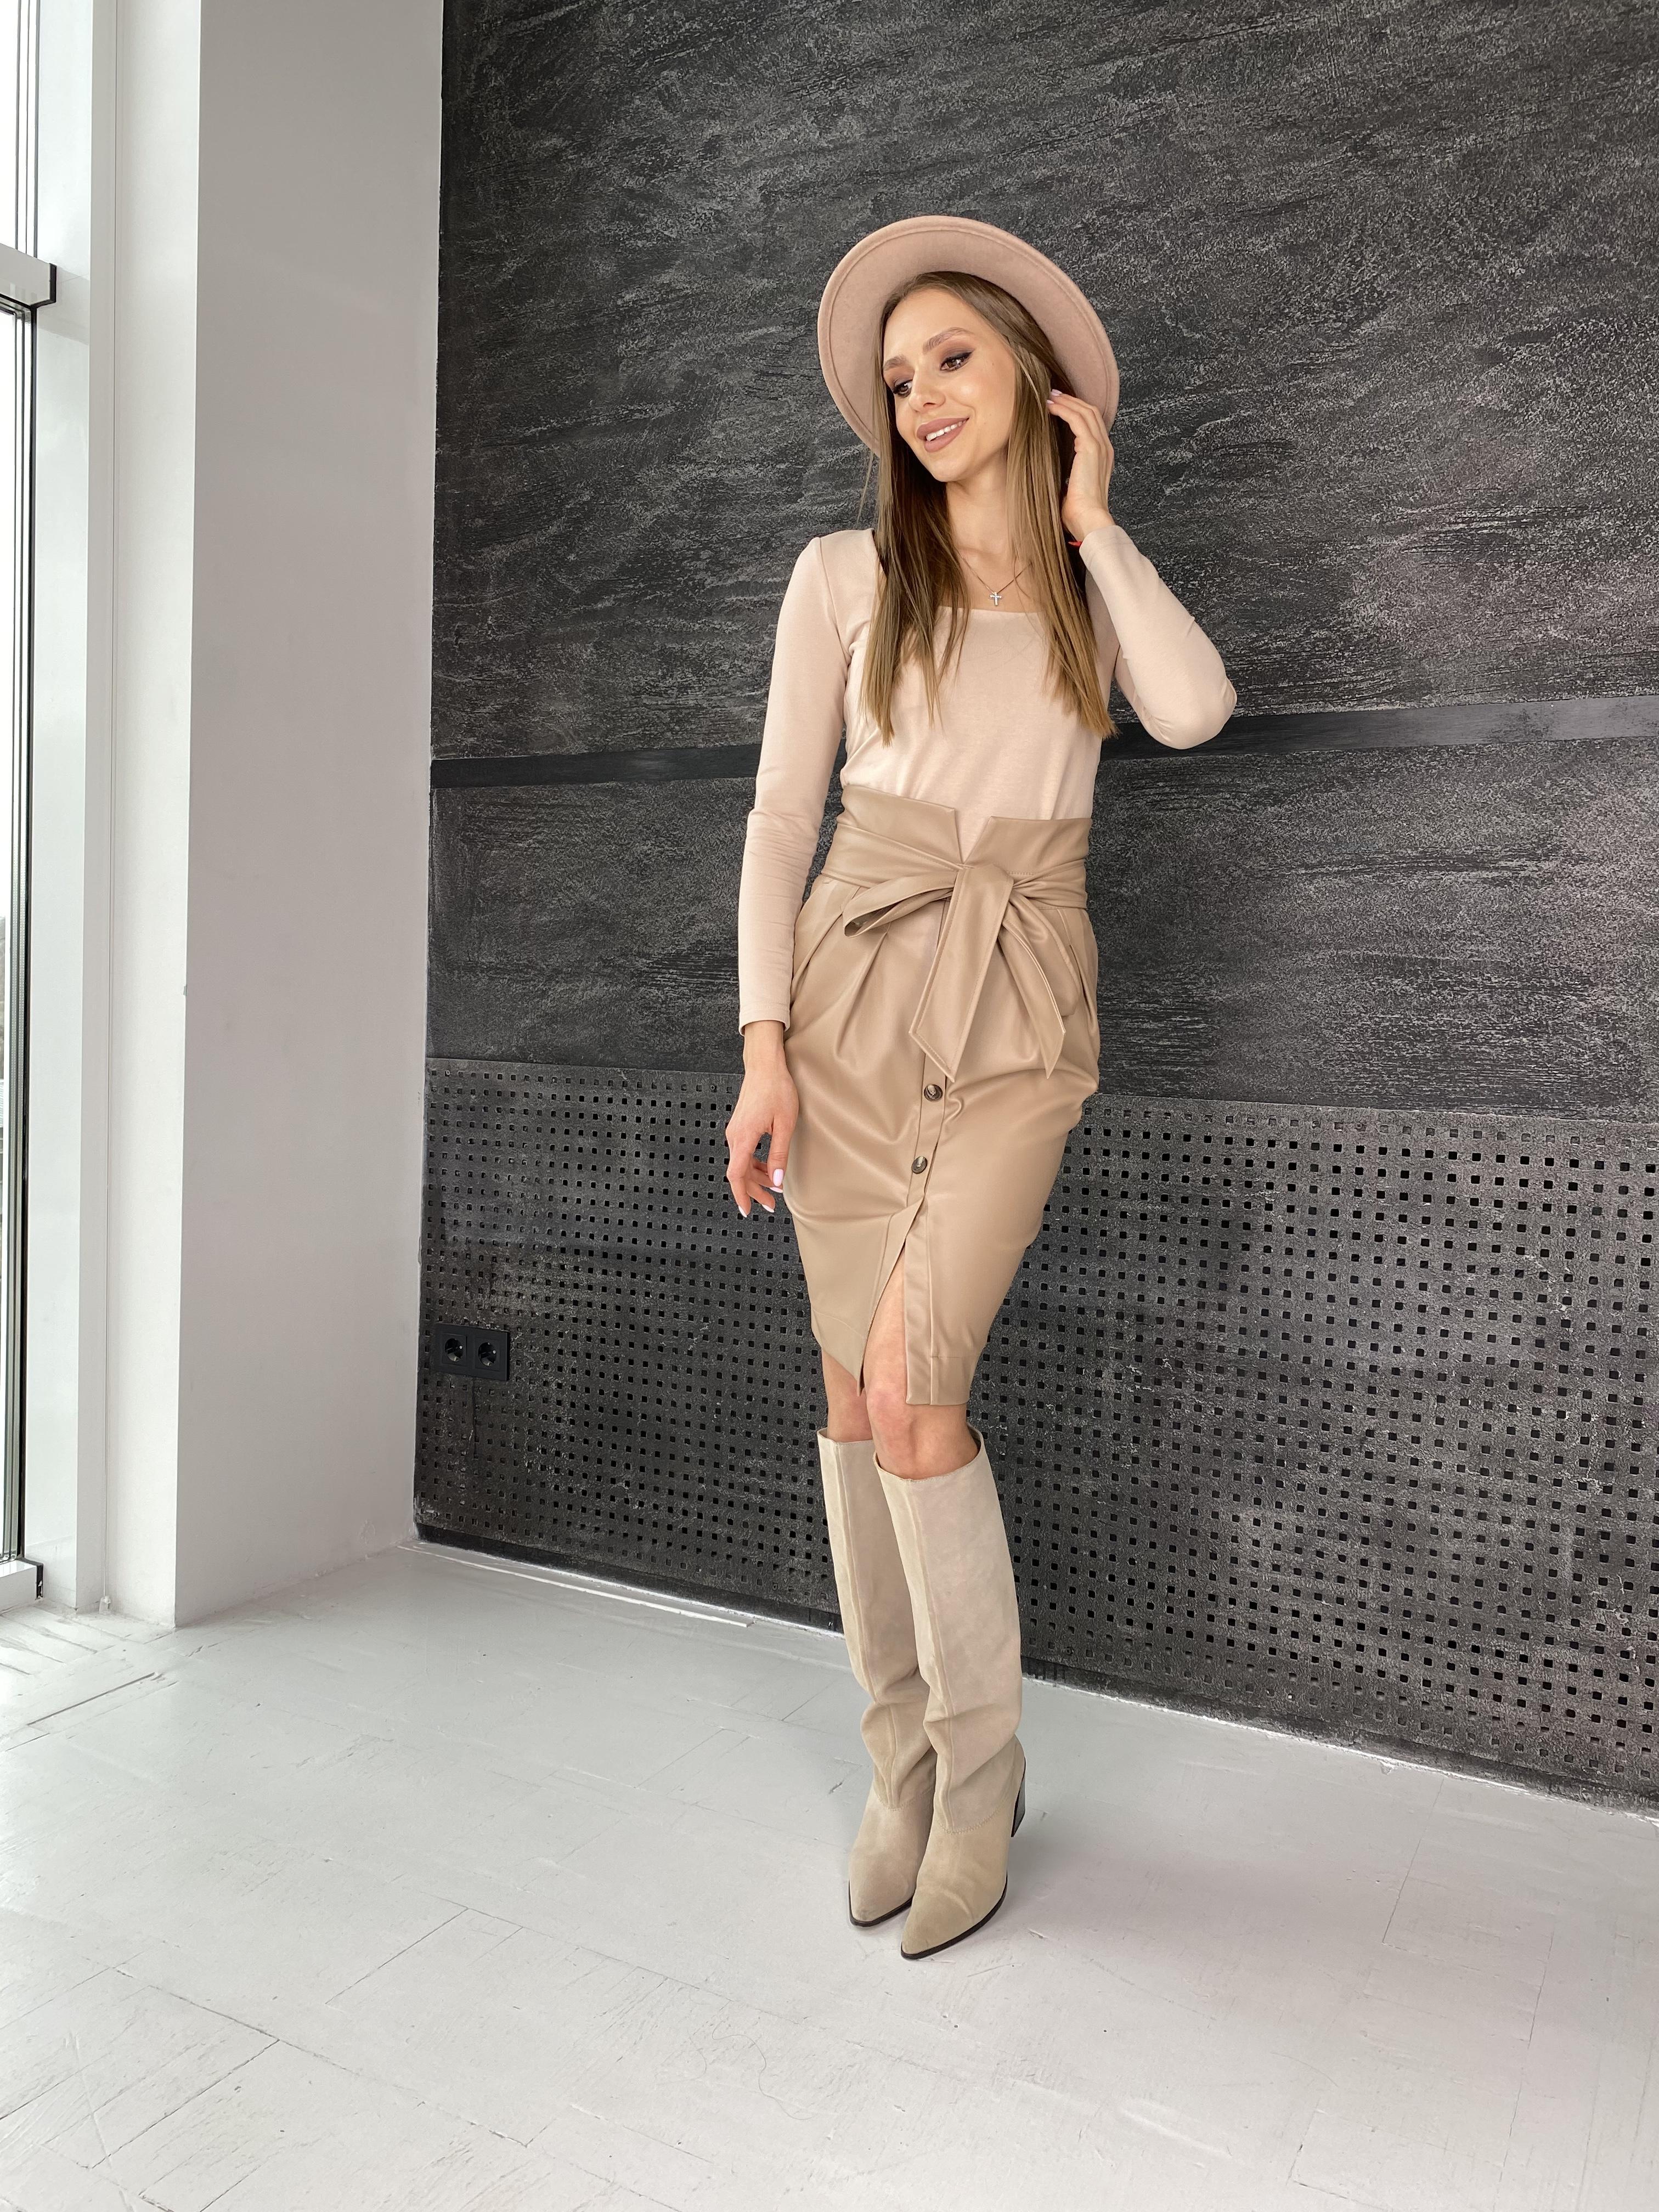 Марси юбка из экокожи 7913 АРТ. 46105 Цвет: Бежевый - фото 4, интернет магазин tm-modus.ru